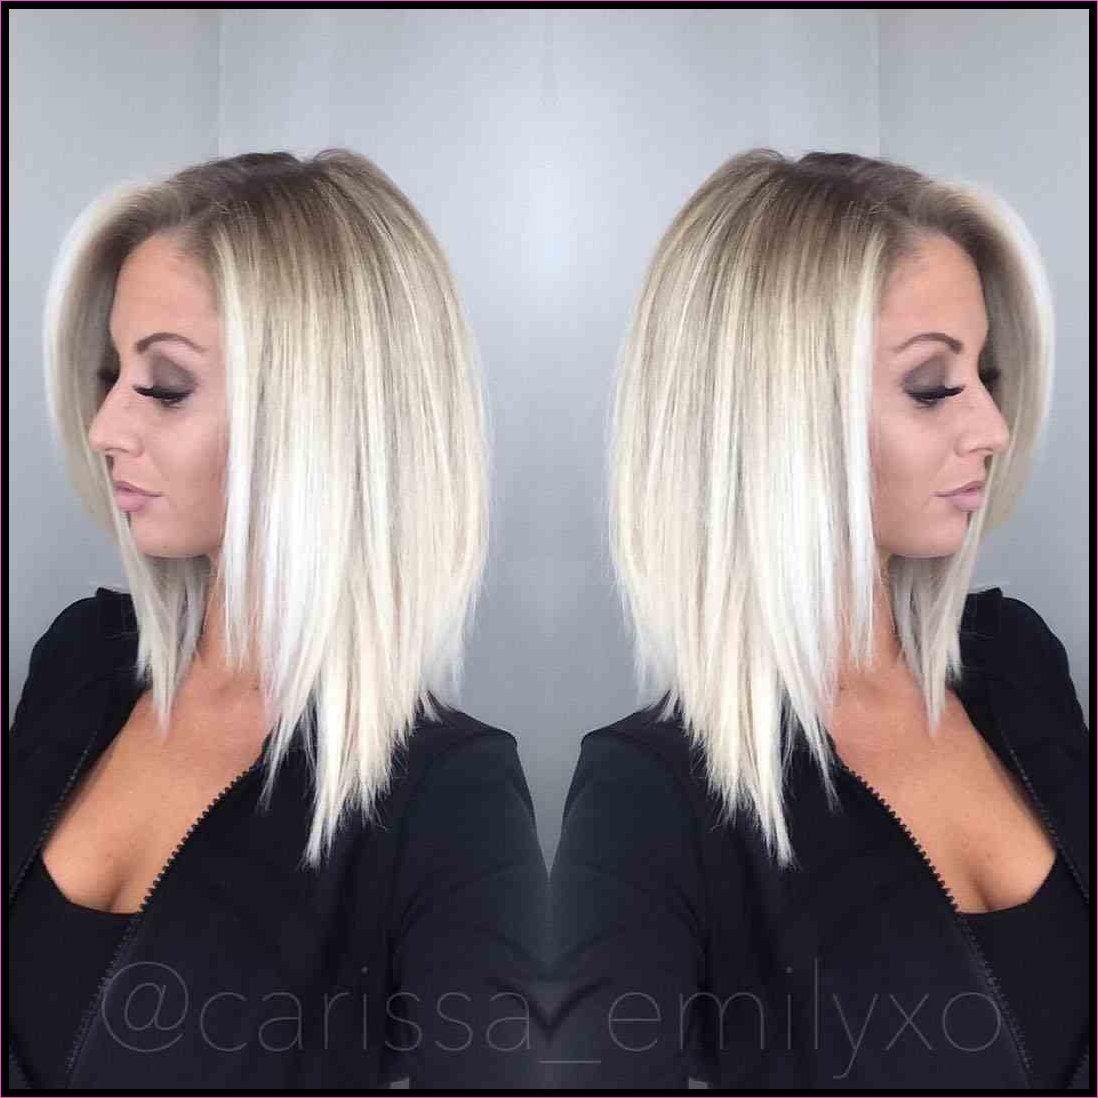 10 Stilvolle Lob Frisur Ideen Schulter Lange Haarschnitt Fur Frauen Lange Bob Frisuren Modische Frisuren Bob Frisur